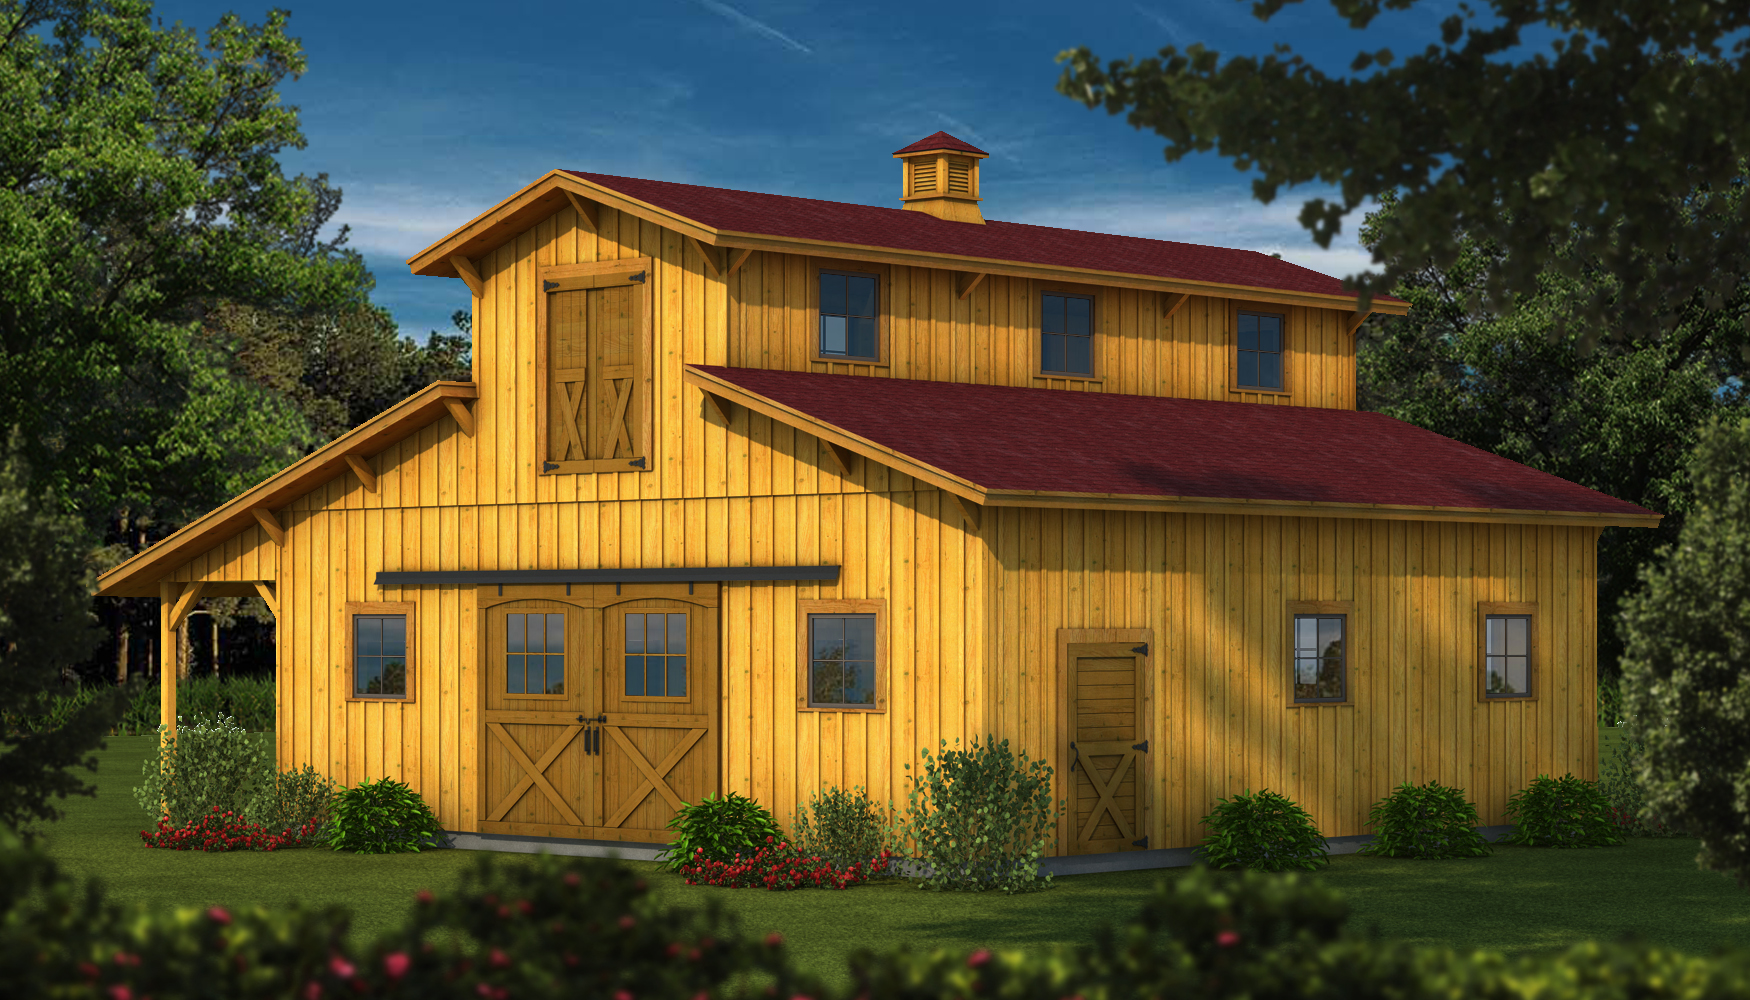 Small Home Designs: Dakota - Plans & Information